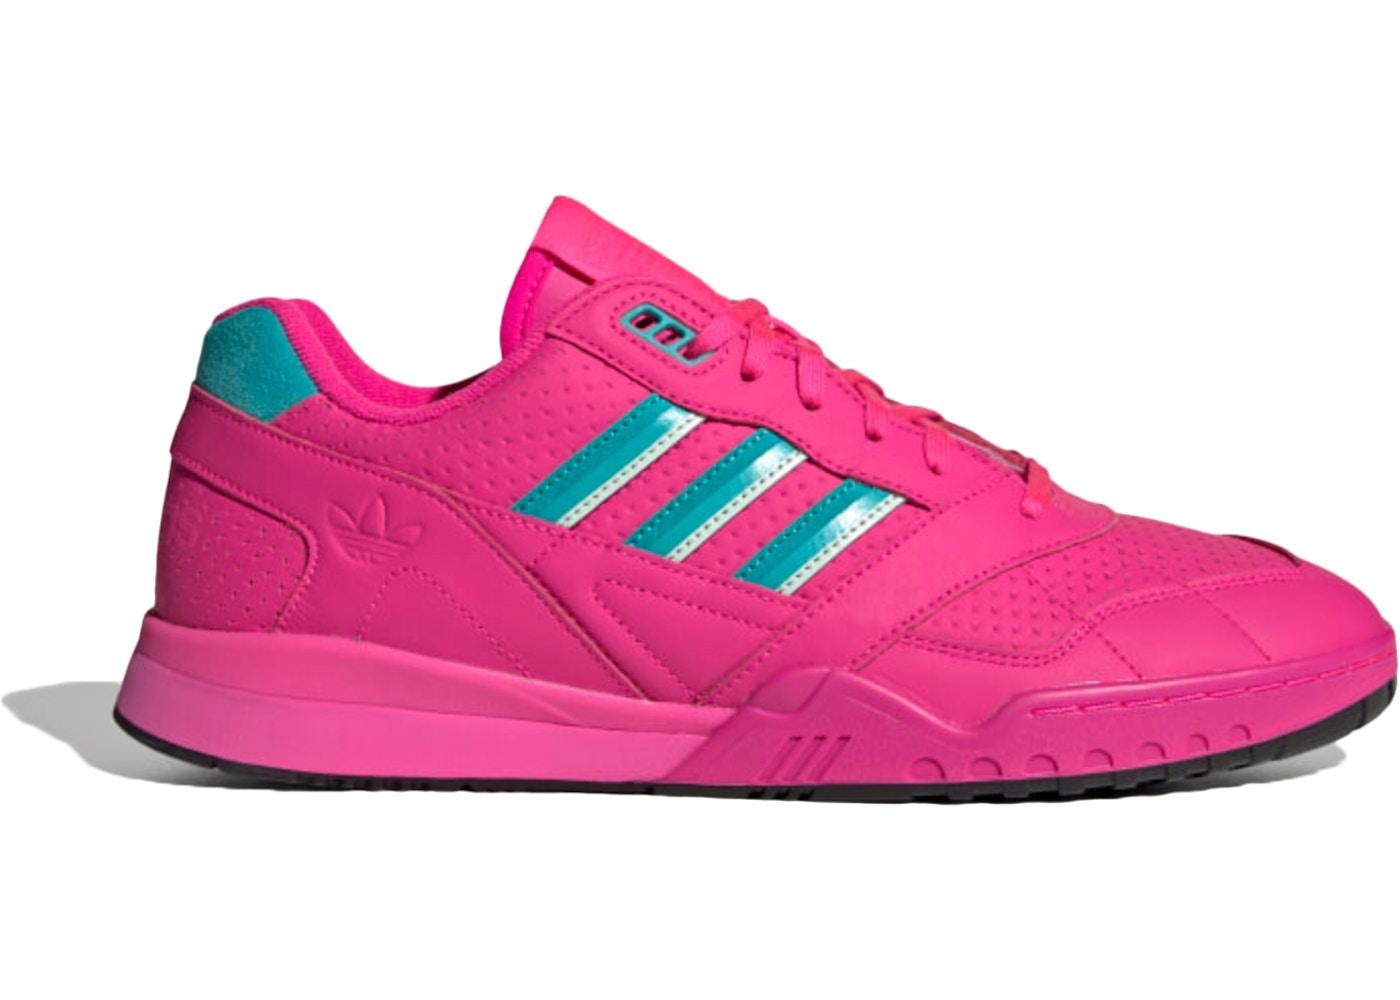 adidas A.R. Trainer Shock Pink